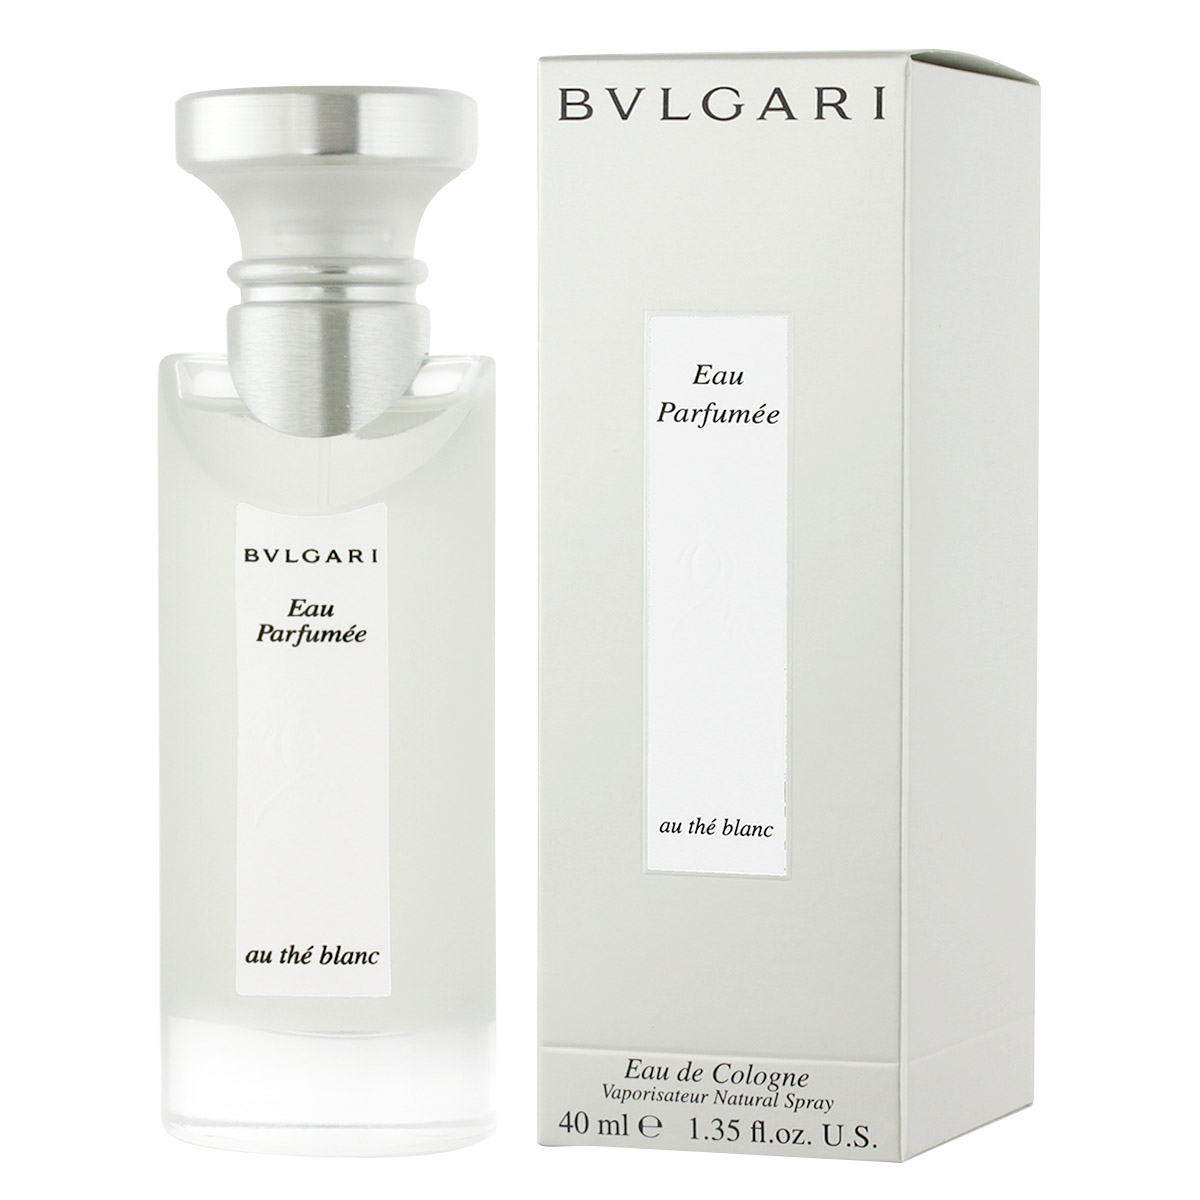 Bvlgari Eau Parfumée au Thé Blanc EDC 40 ml UNISEX